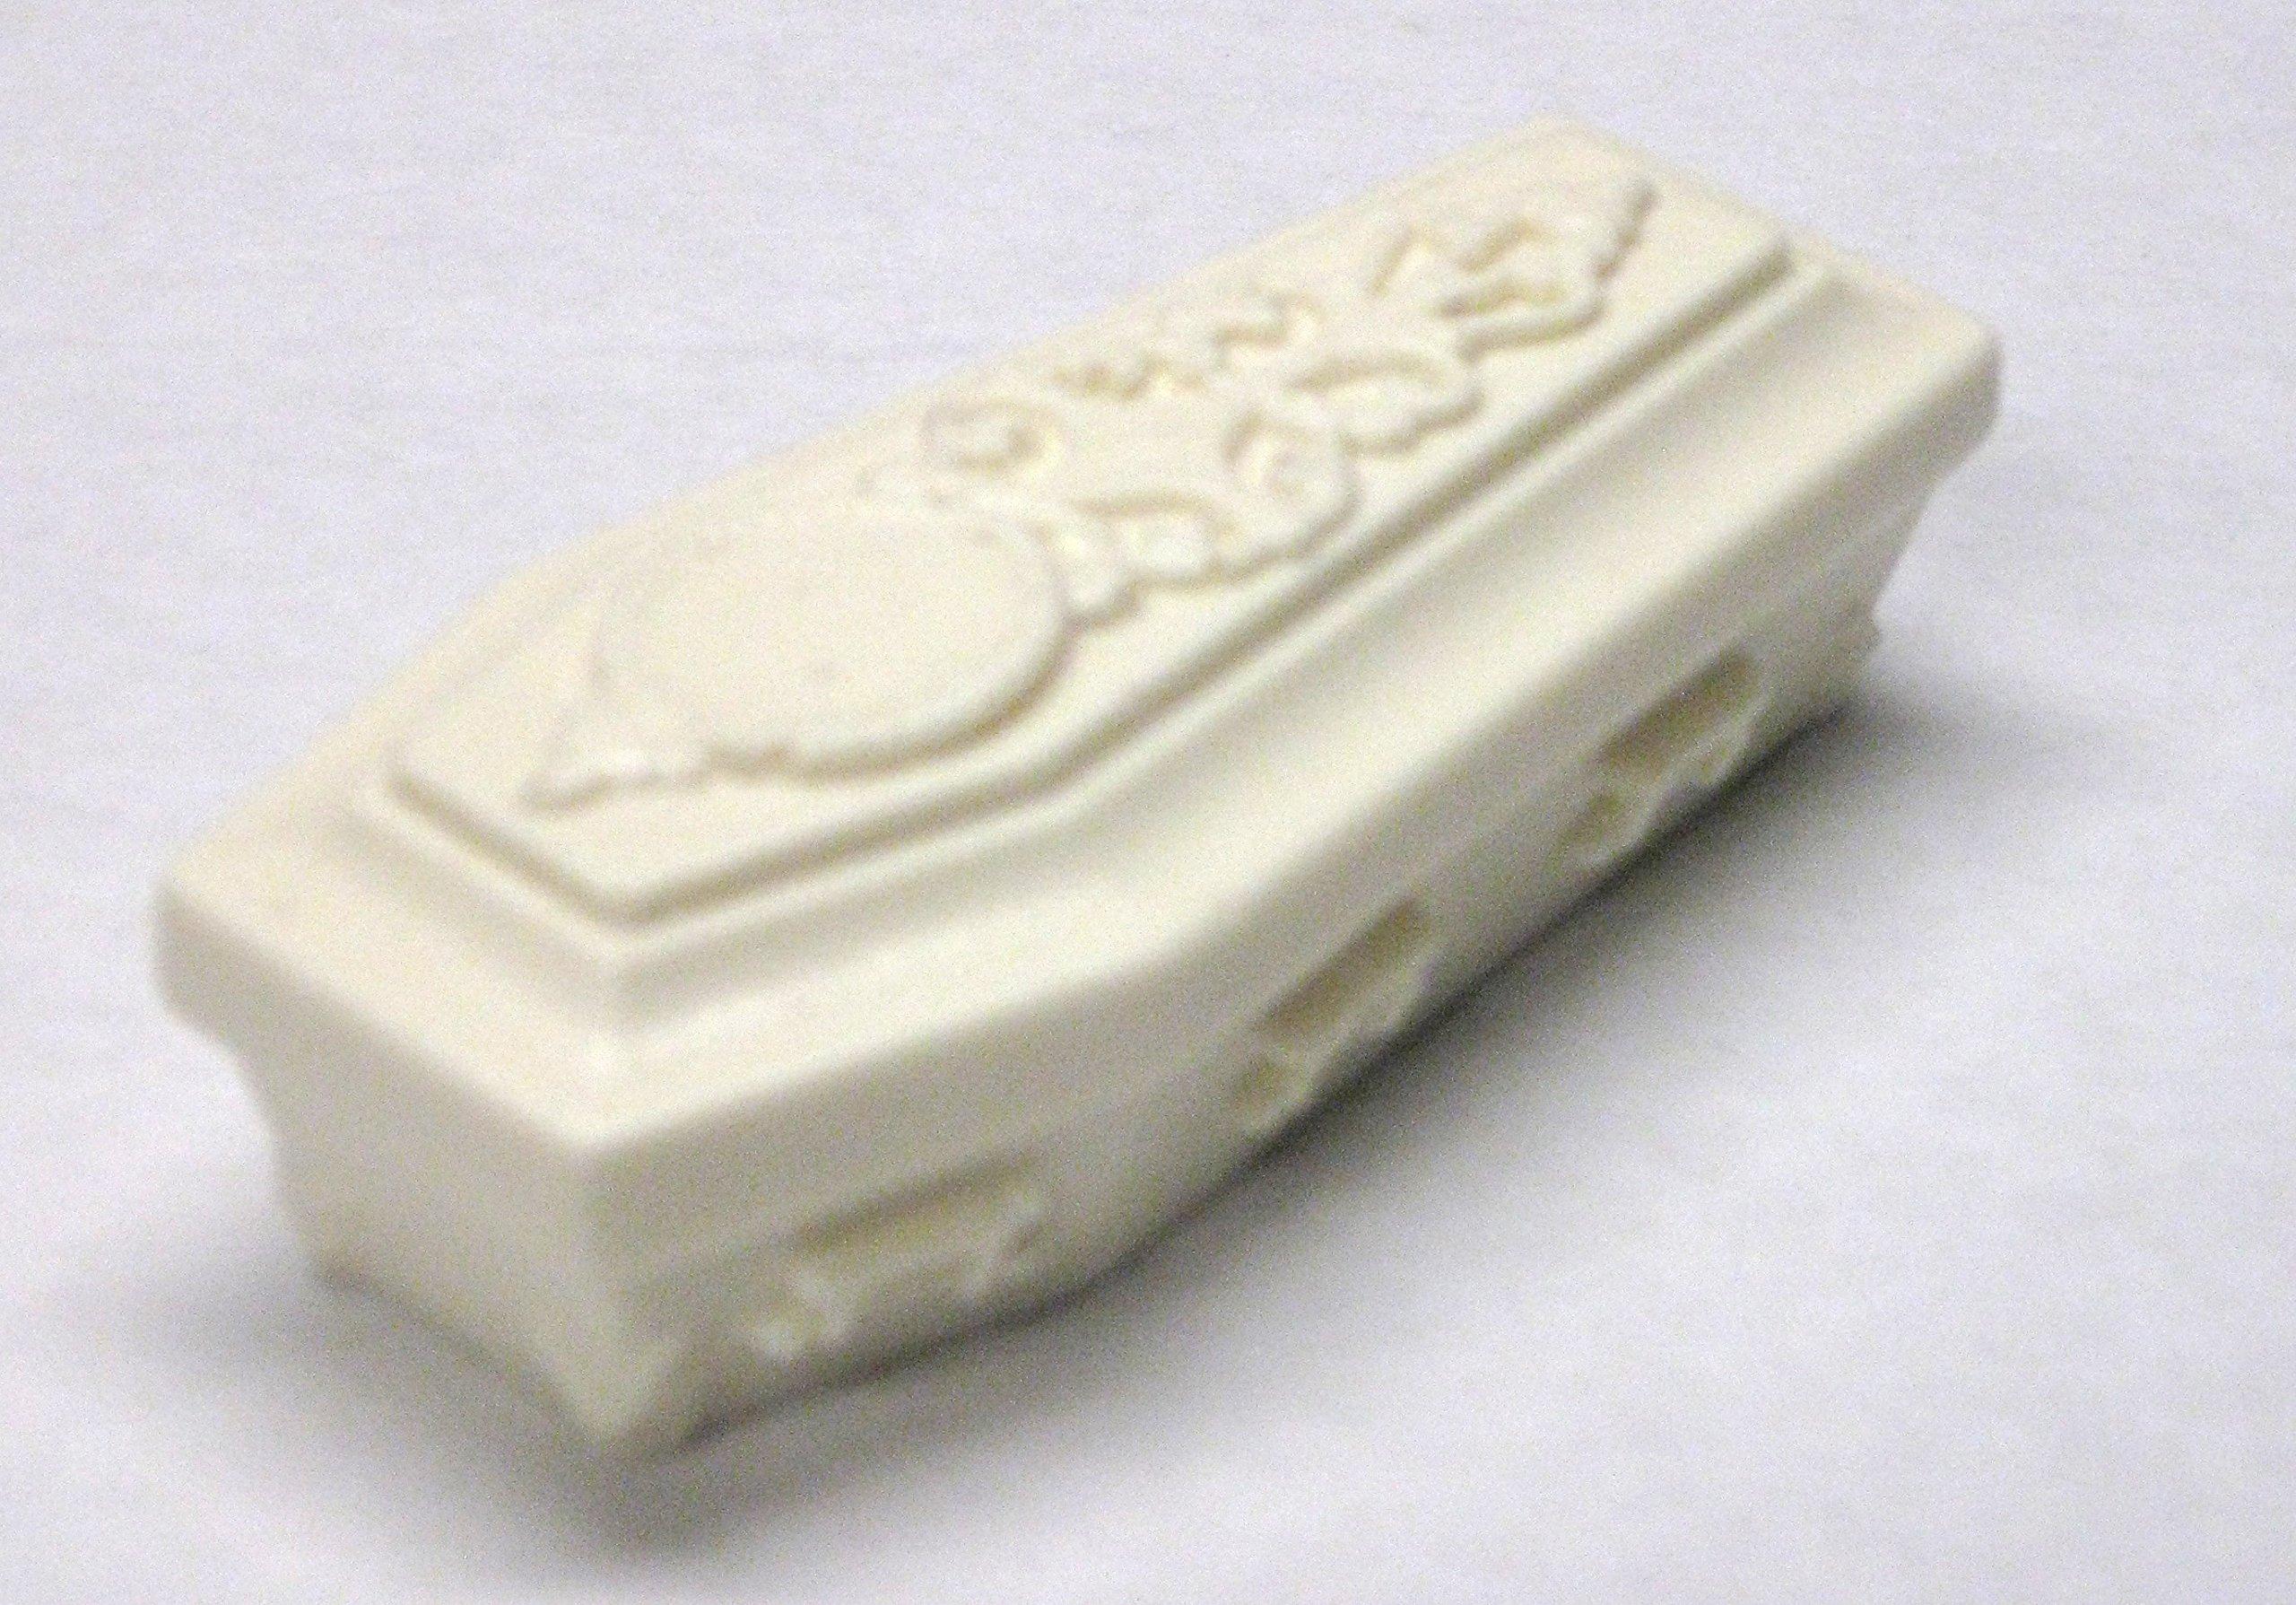 1:25 G scale model funeral toe pincher coffin hearse